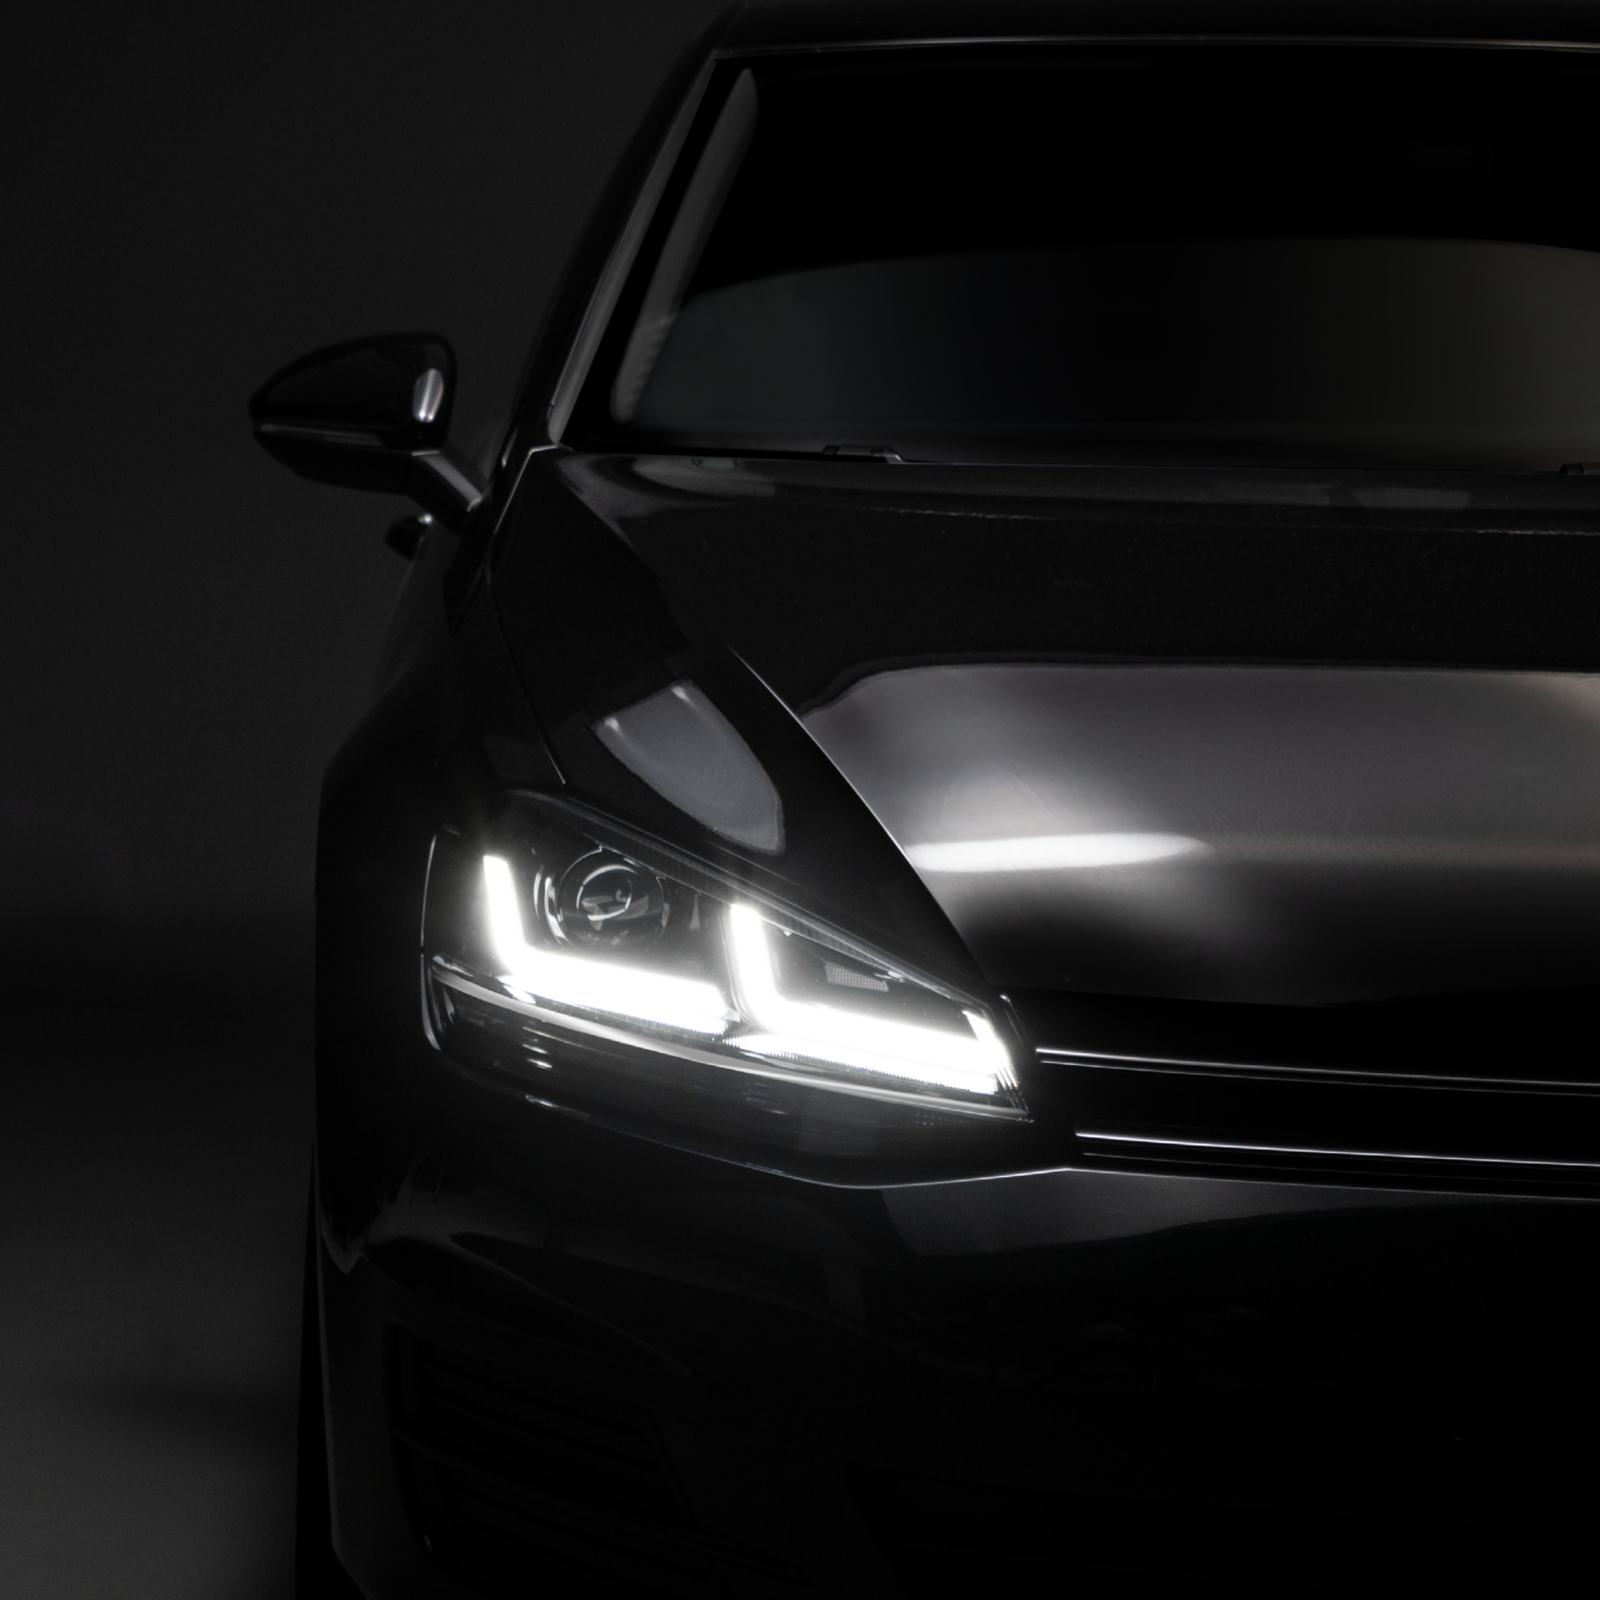 Original VW Golf VII LED-Scheinwerfer Chrom Edition Nachrüstset Osram 5G1052163